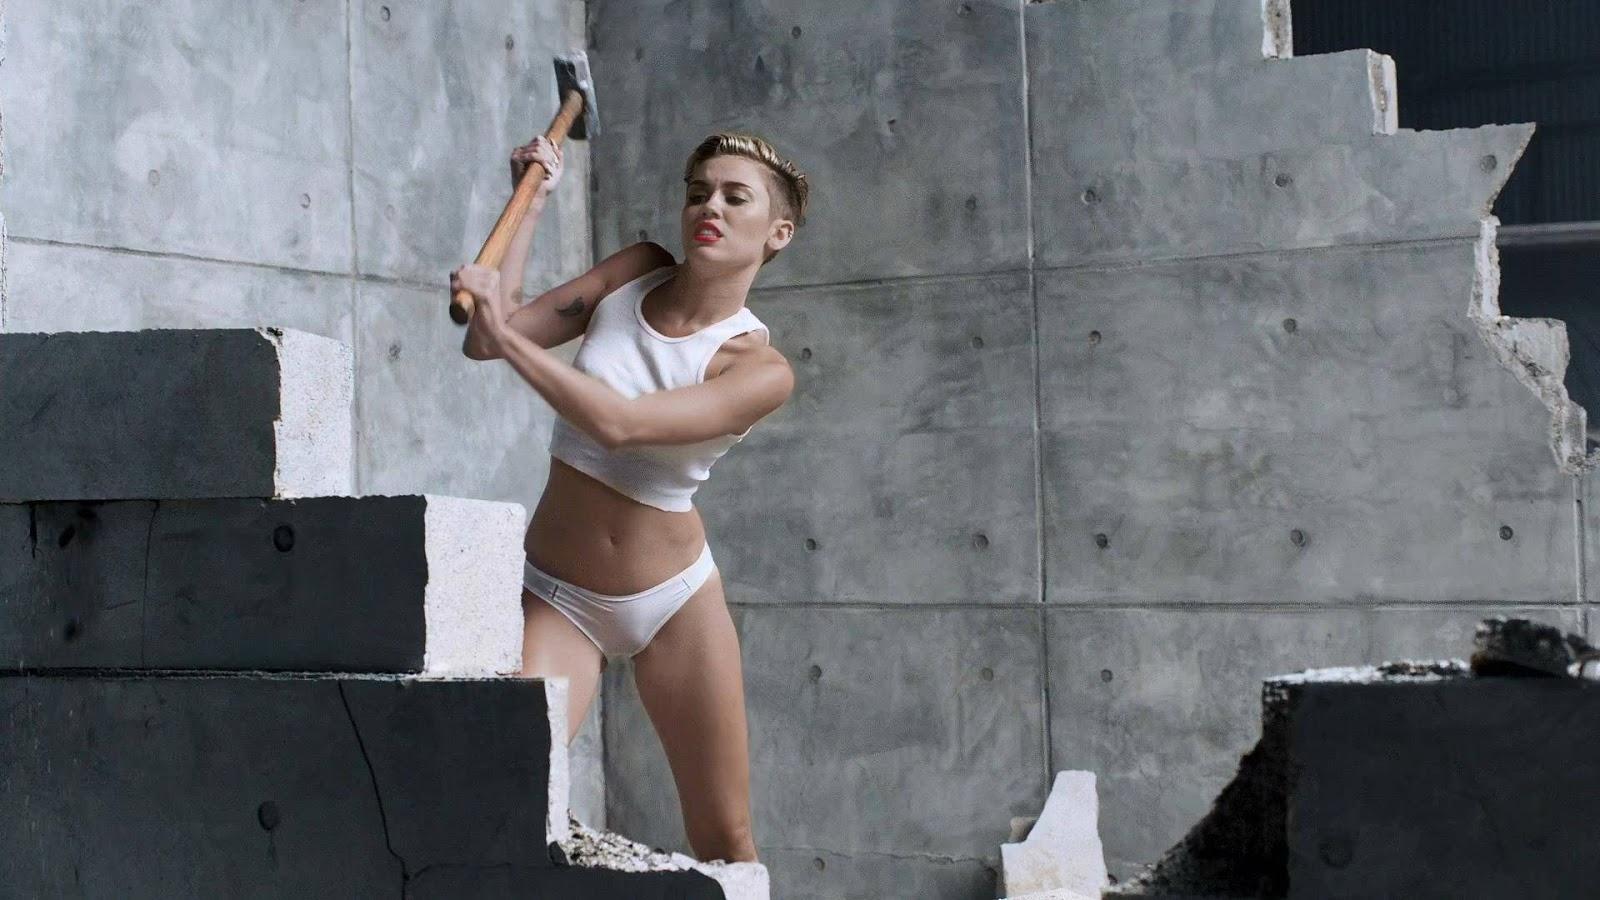 Miley cyrus porn music remix 7